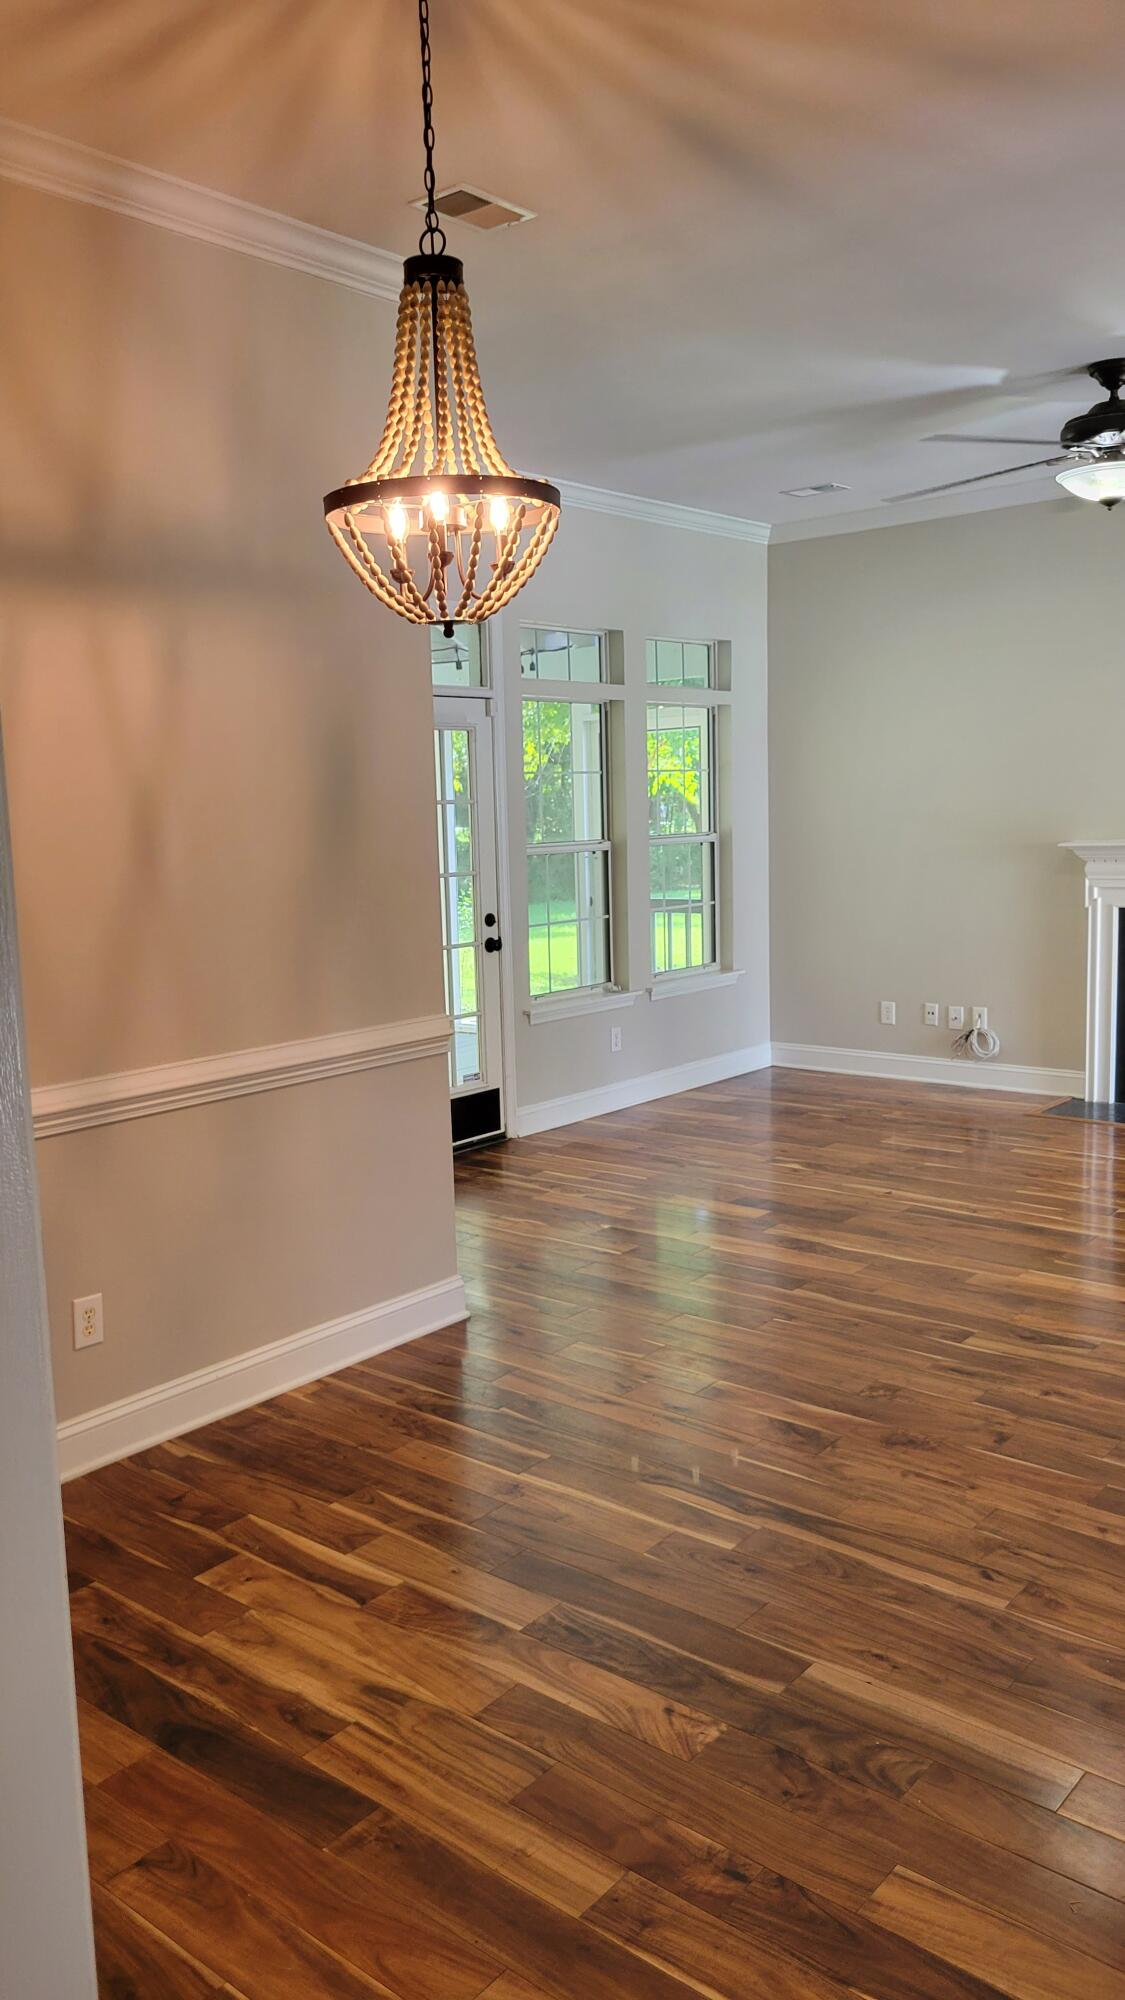 Dunes West Homes For Sale - 2652 Palmetto Hall, Mount Pleasant, SC - 8